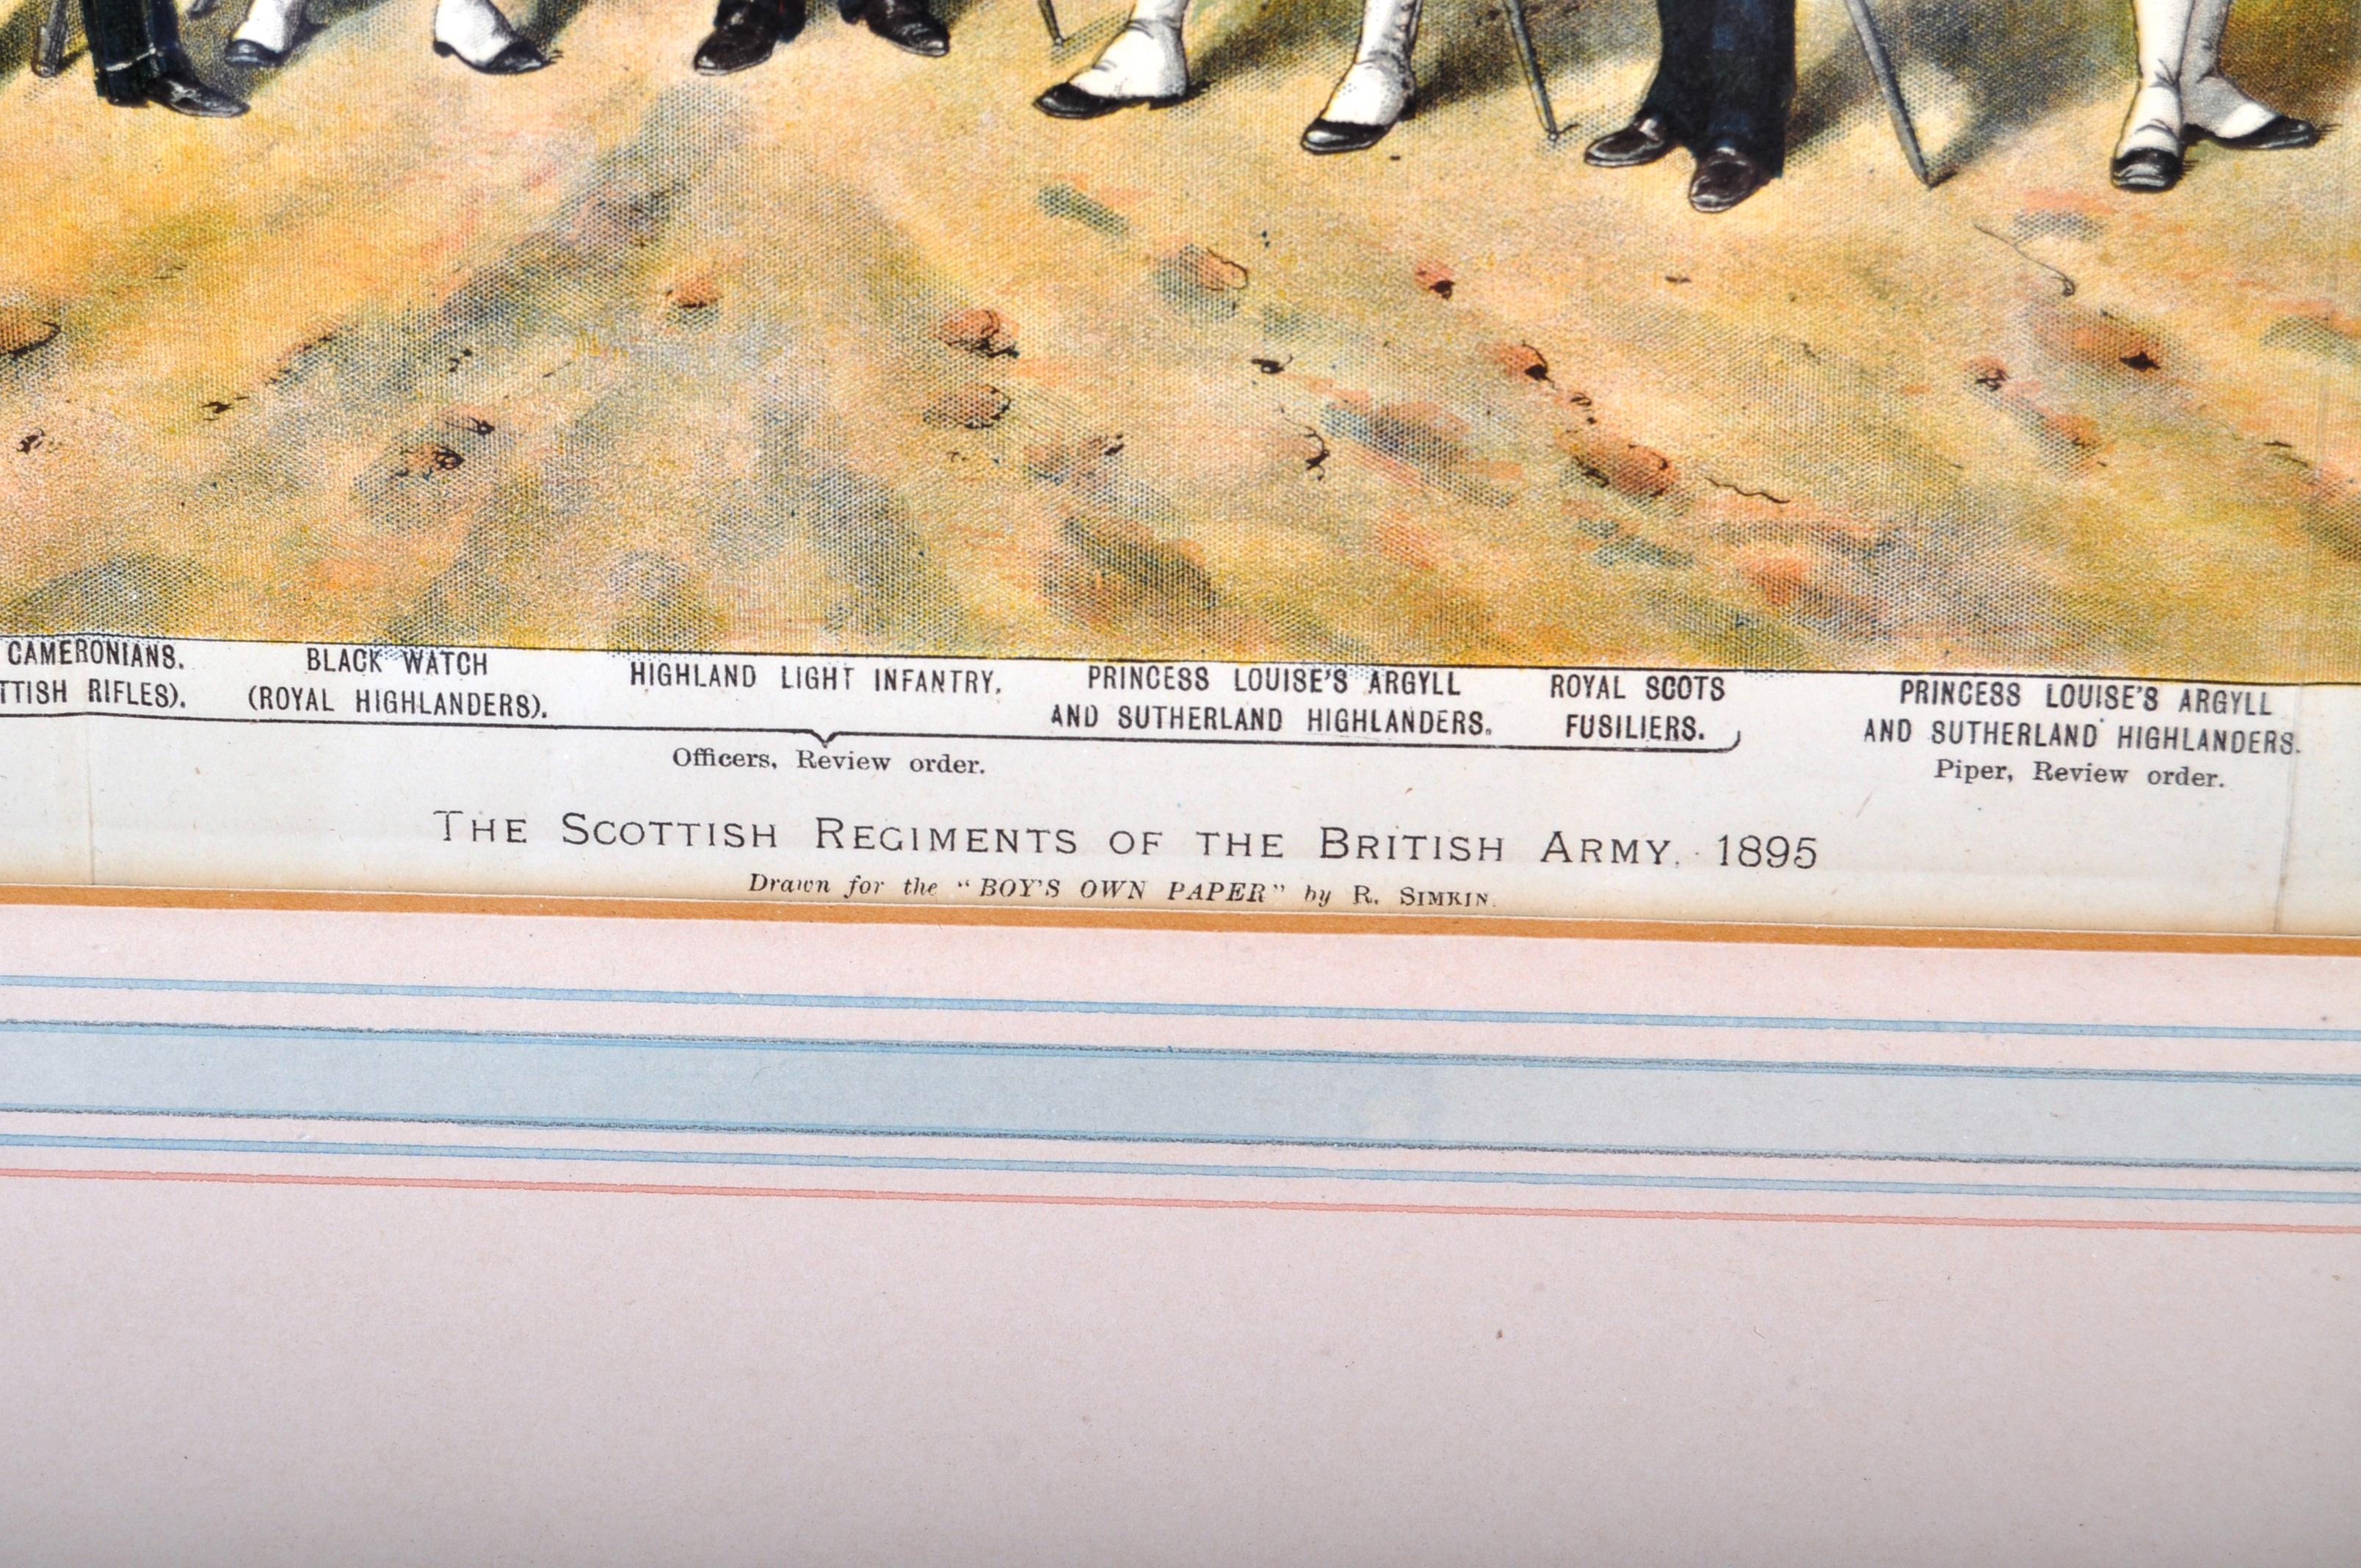 RICHARD SIMKIN - THE SCOTTISH REGIMENTS OF THE BRITISH ARMY - Image 5 of 7